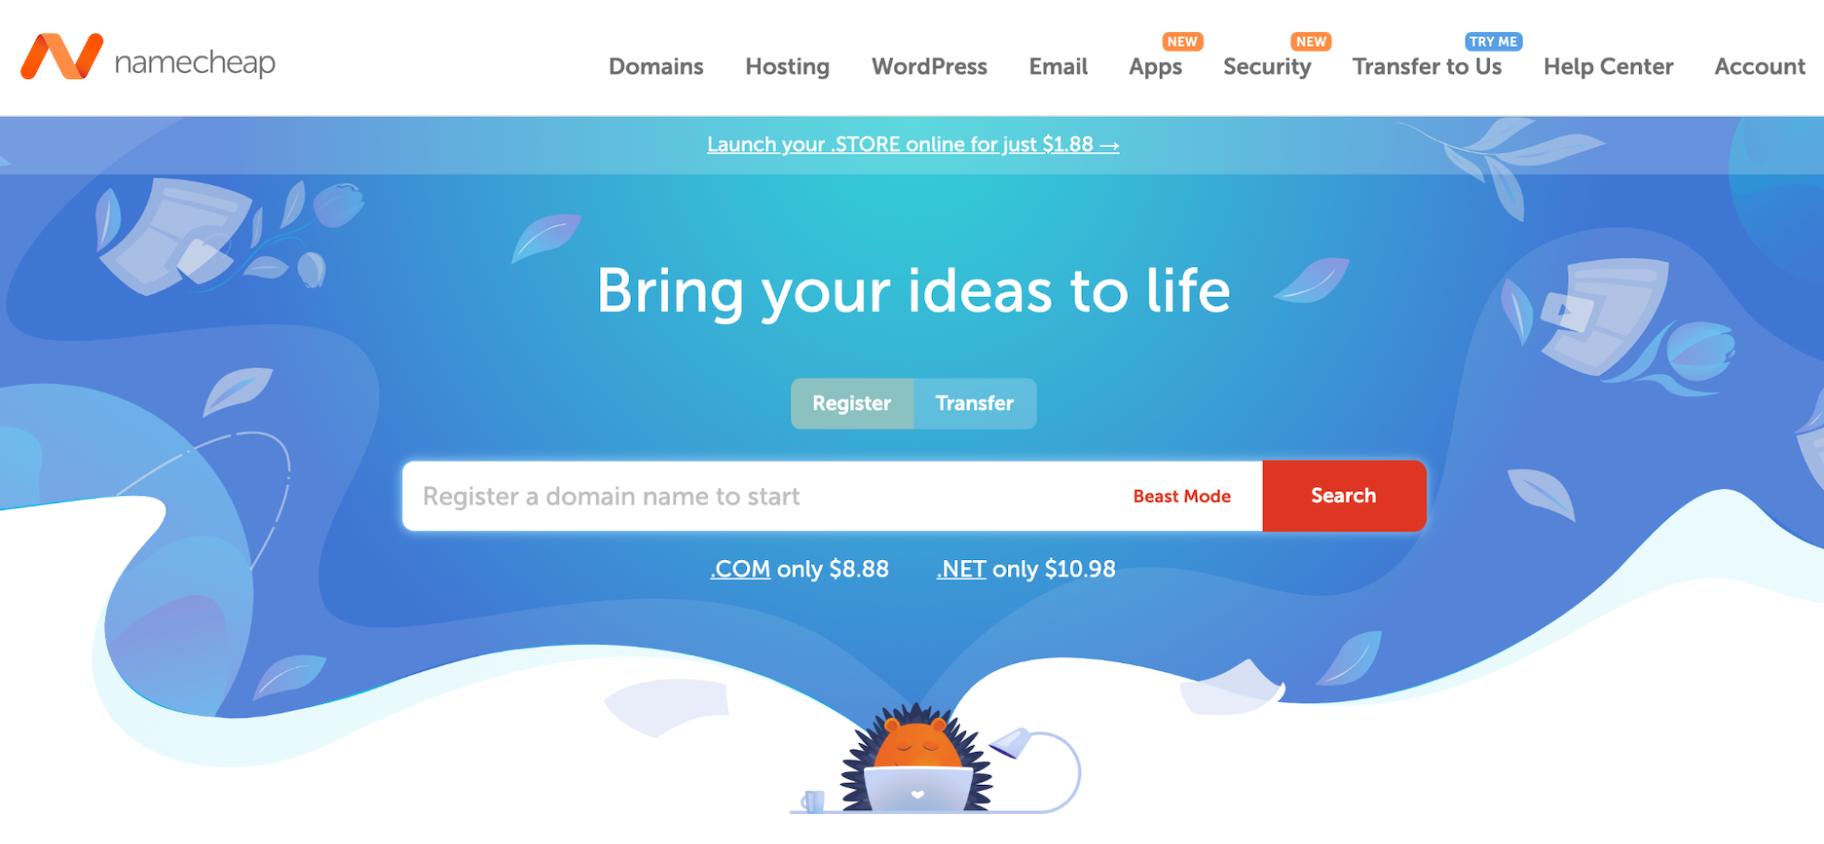 Sites Like GoDaddy: Namecheap